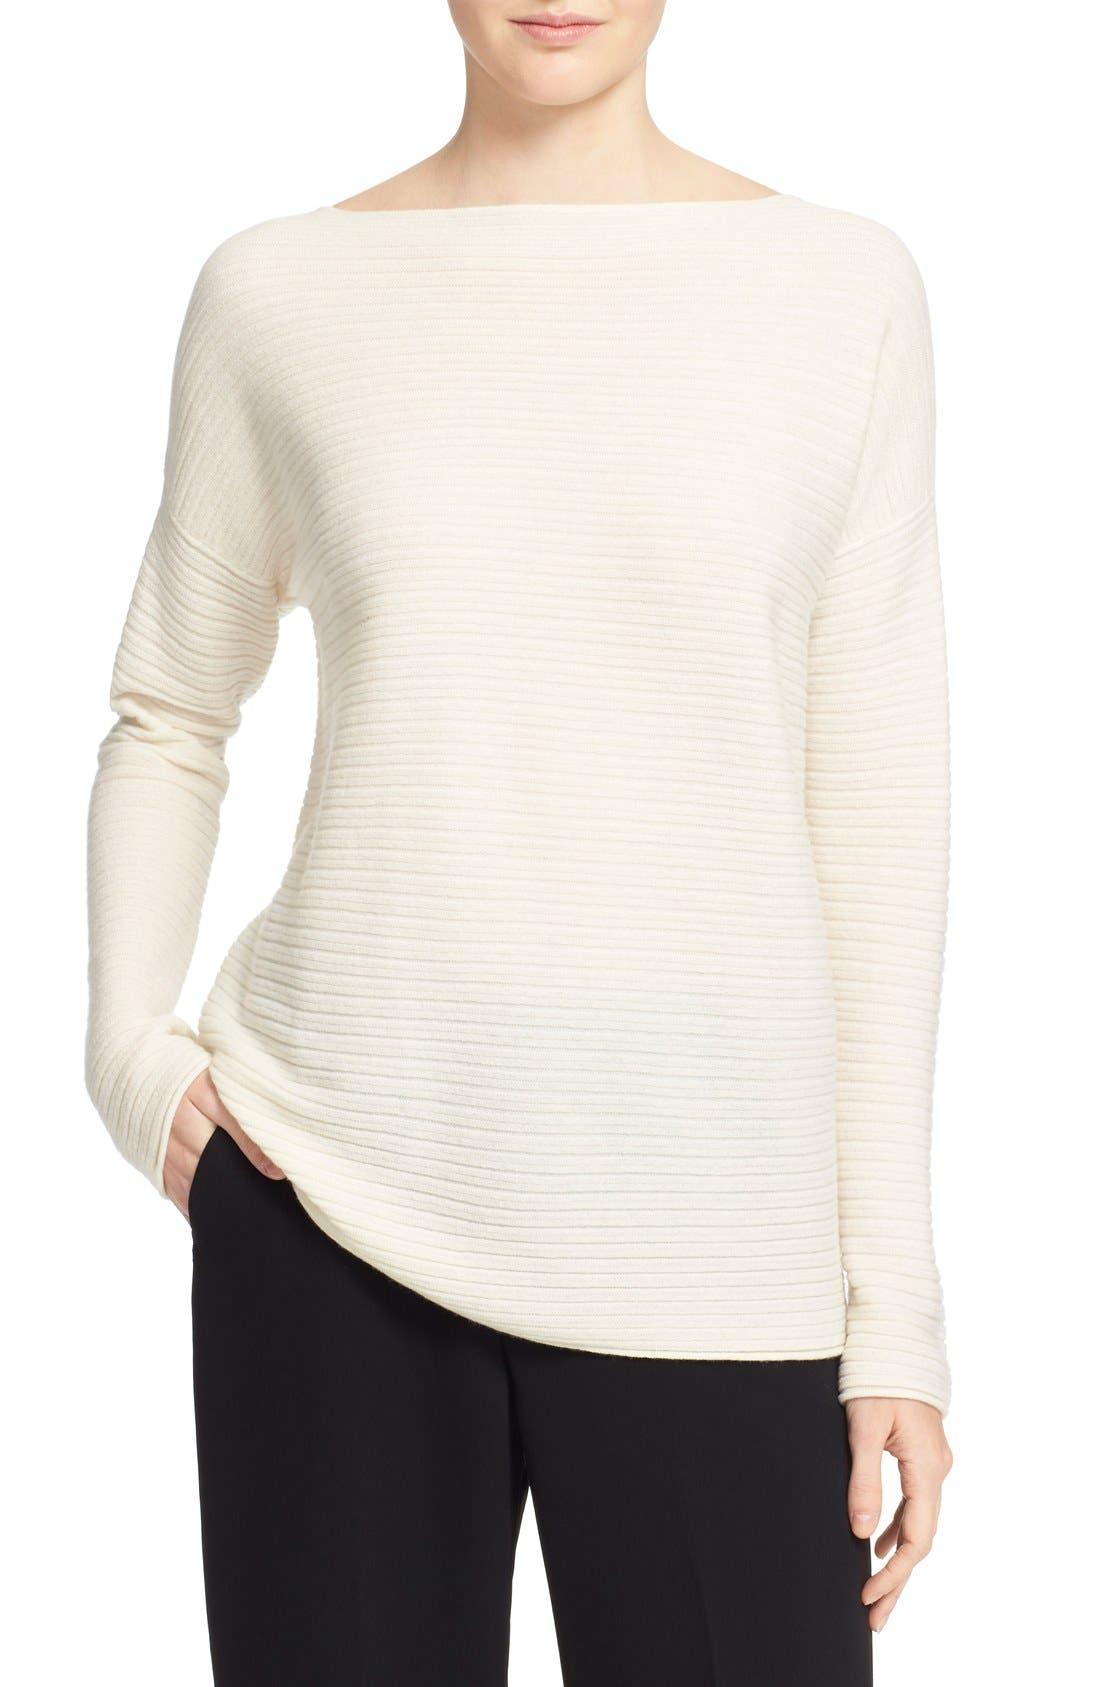 Alternate Image 1 Selected - Vince Boatneck Horizontal Rib Cashmere Sweater